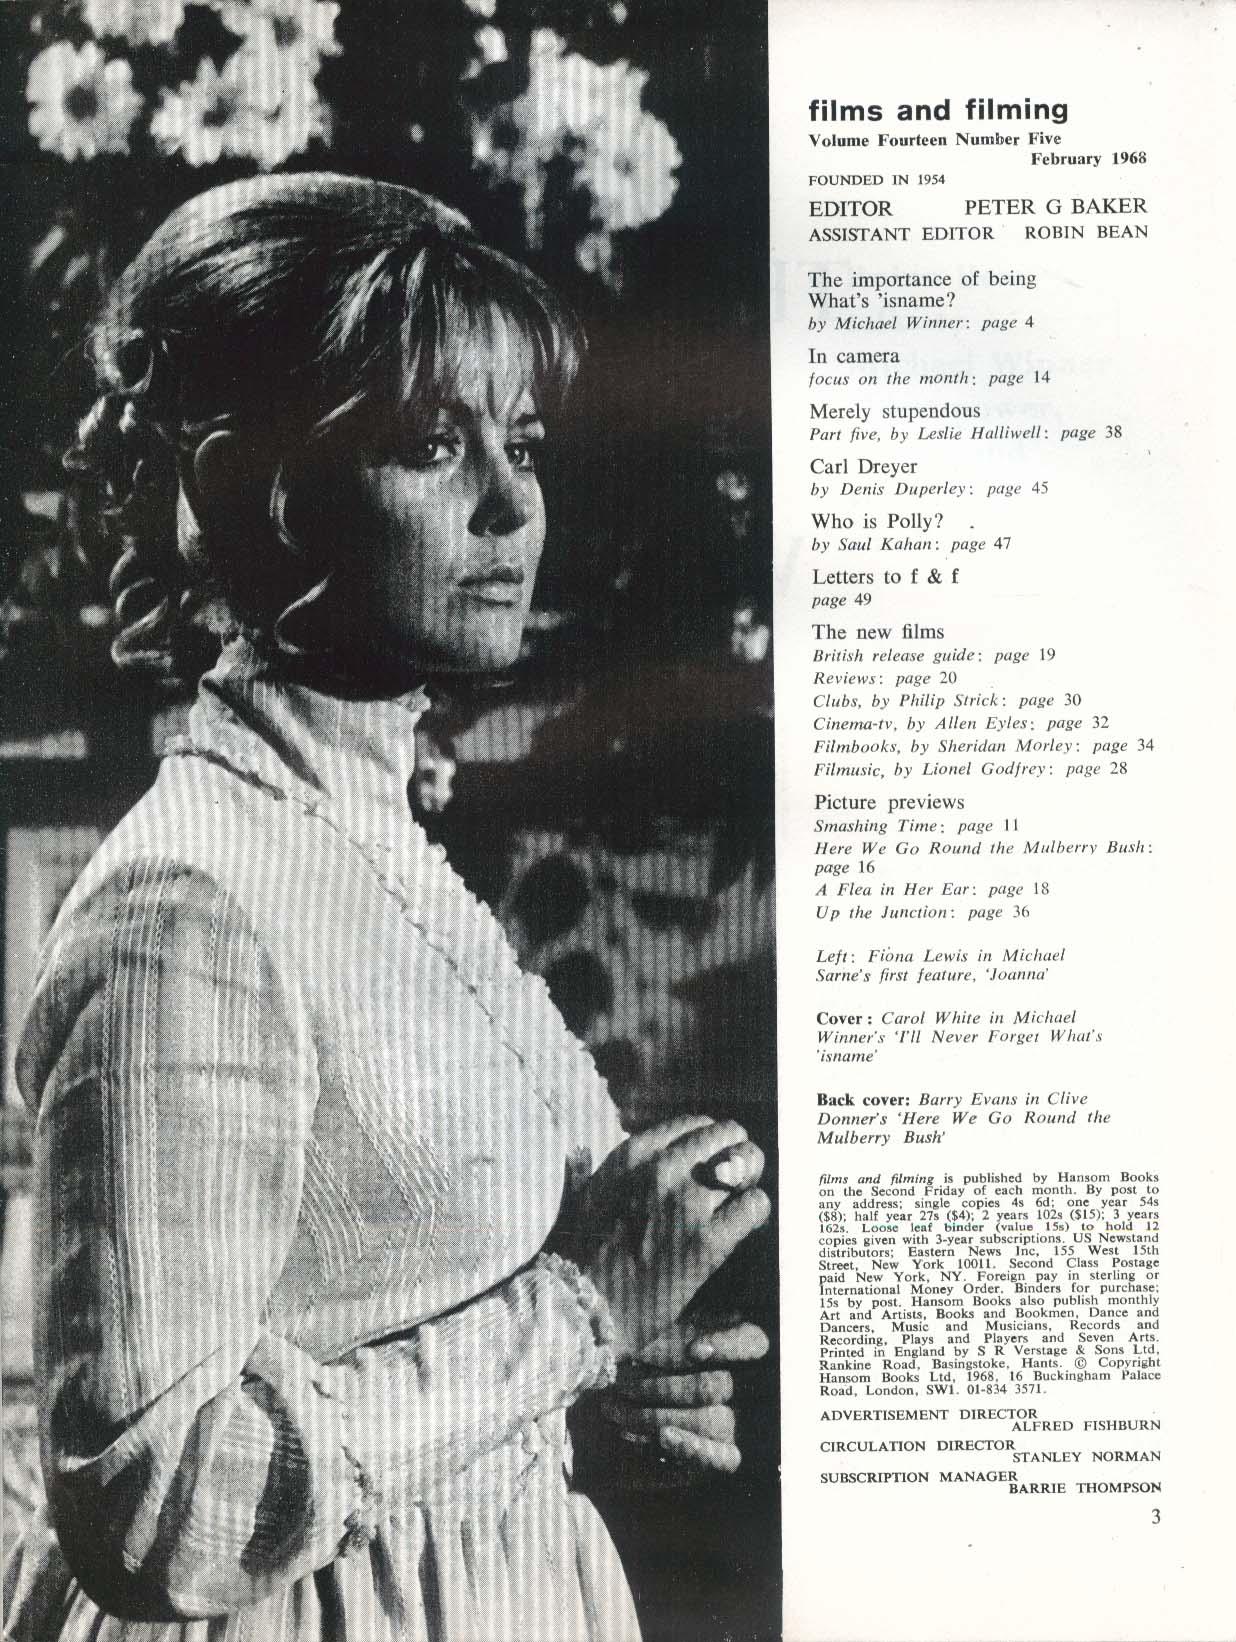 FILMS & FILMING Carol White Michael Winner Dennis Duperley Saul Kahan + 2 1968